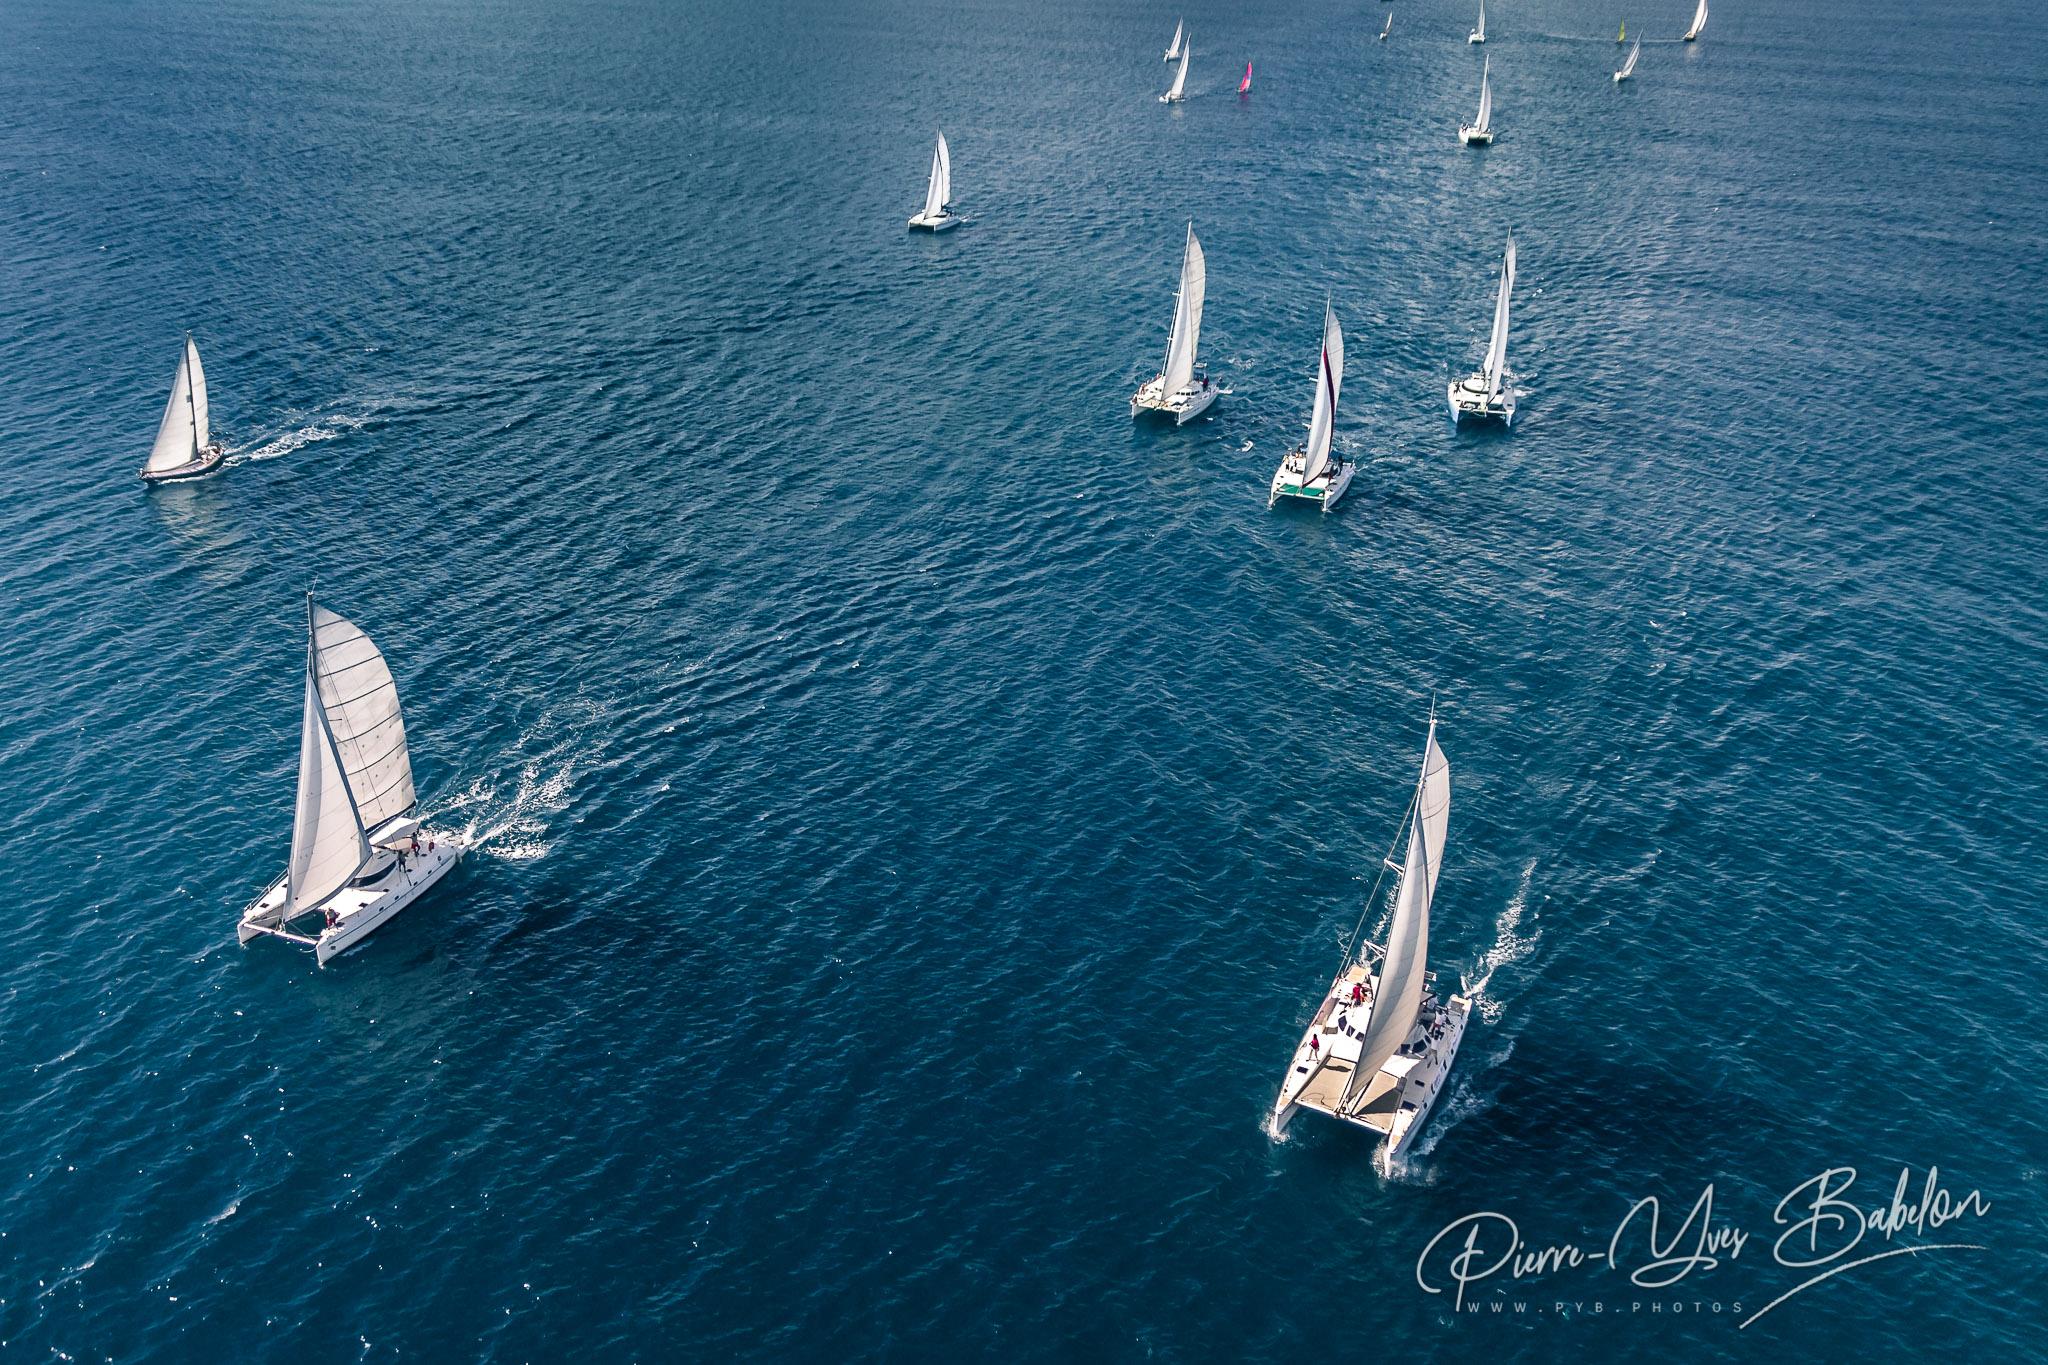 Regatta in the Indian Ocean